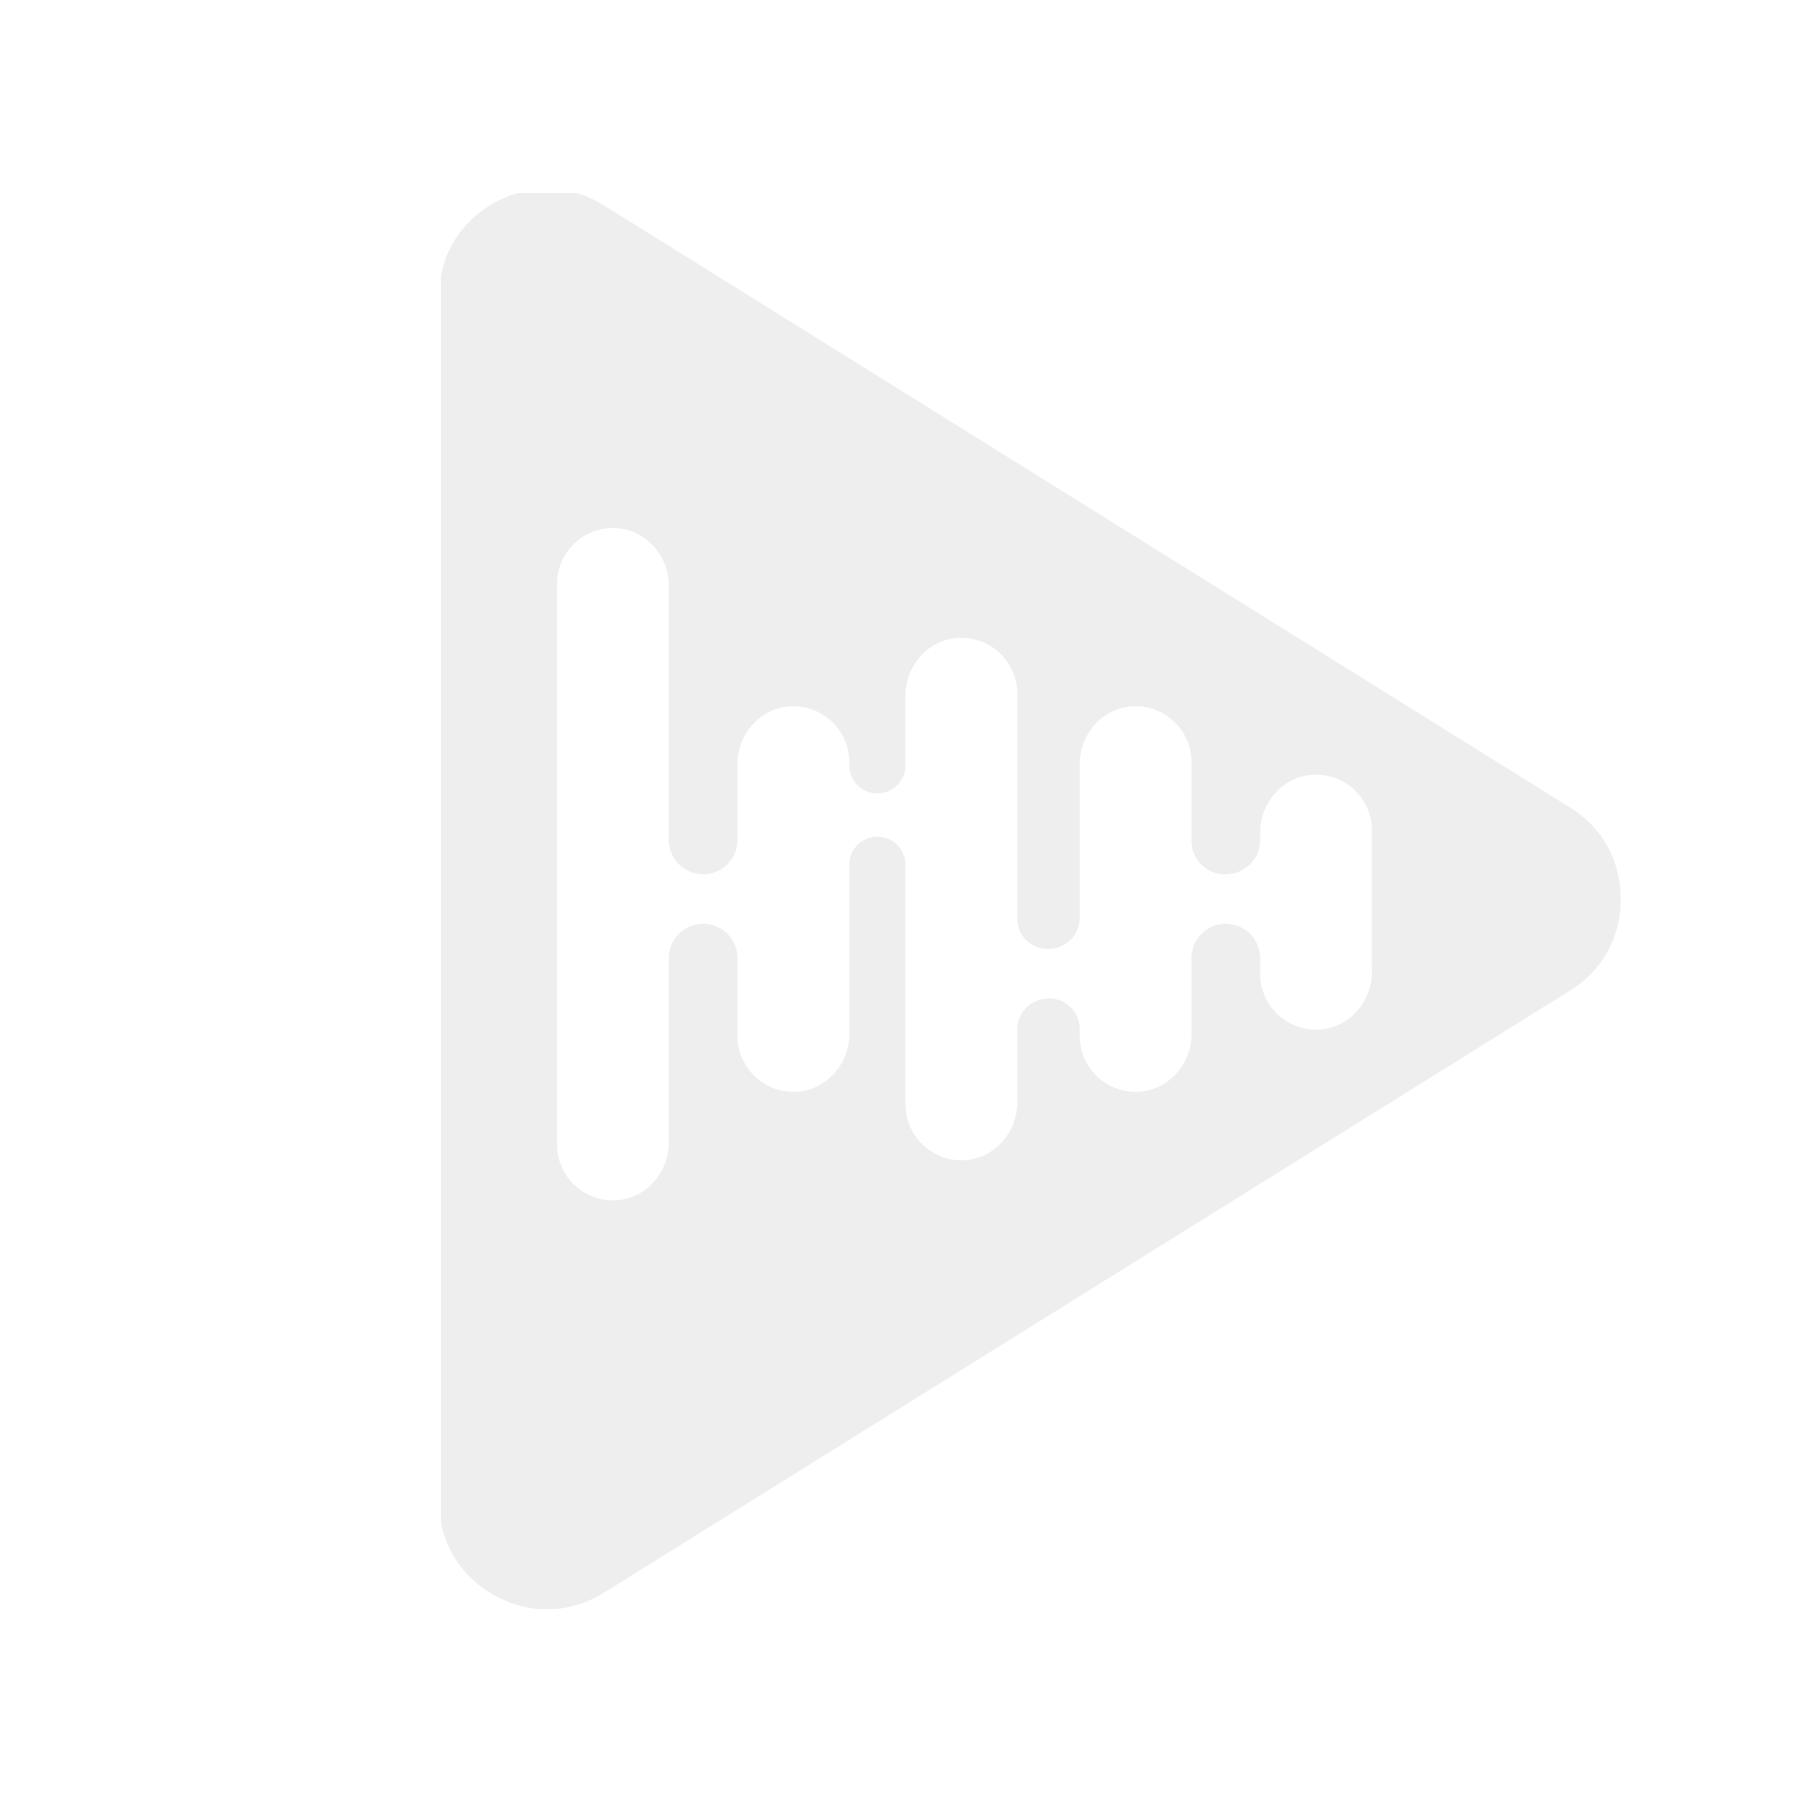 Kenwood KCARC405 Fjernkontroll, Med tlf knapp, 1999 ->